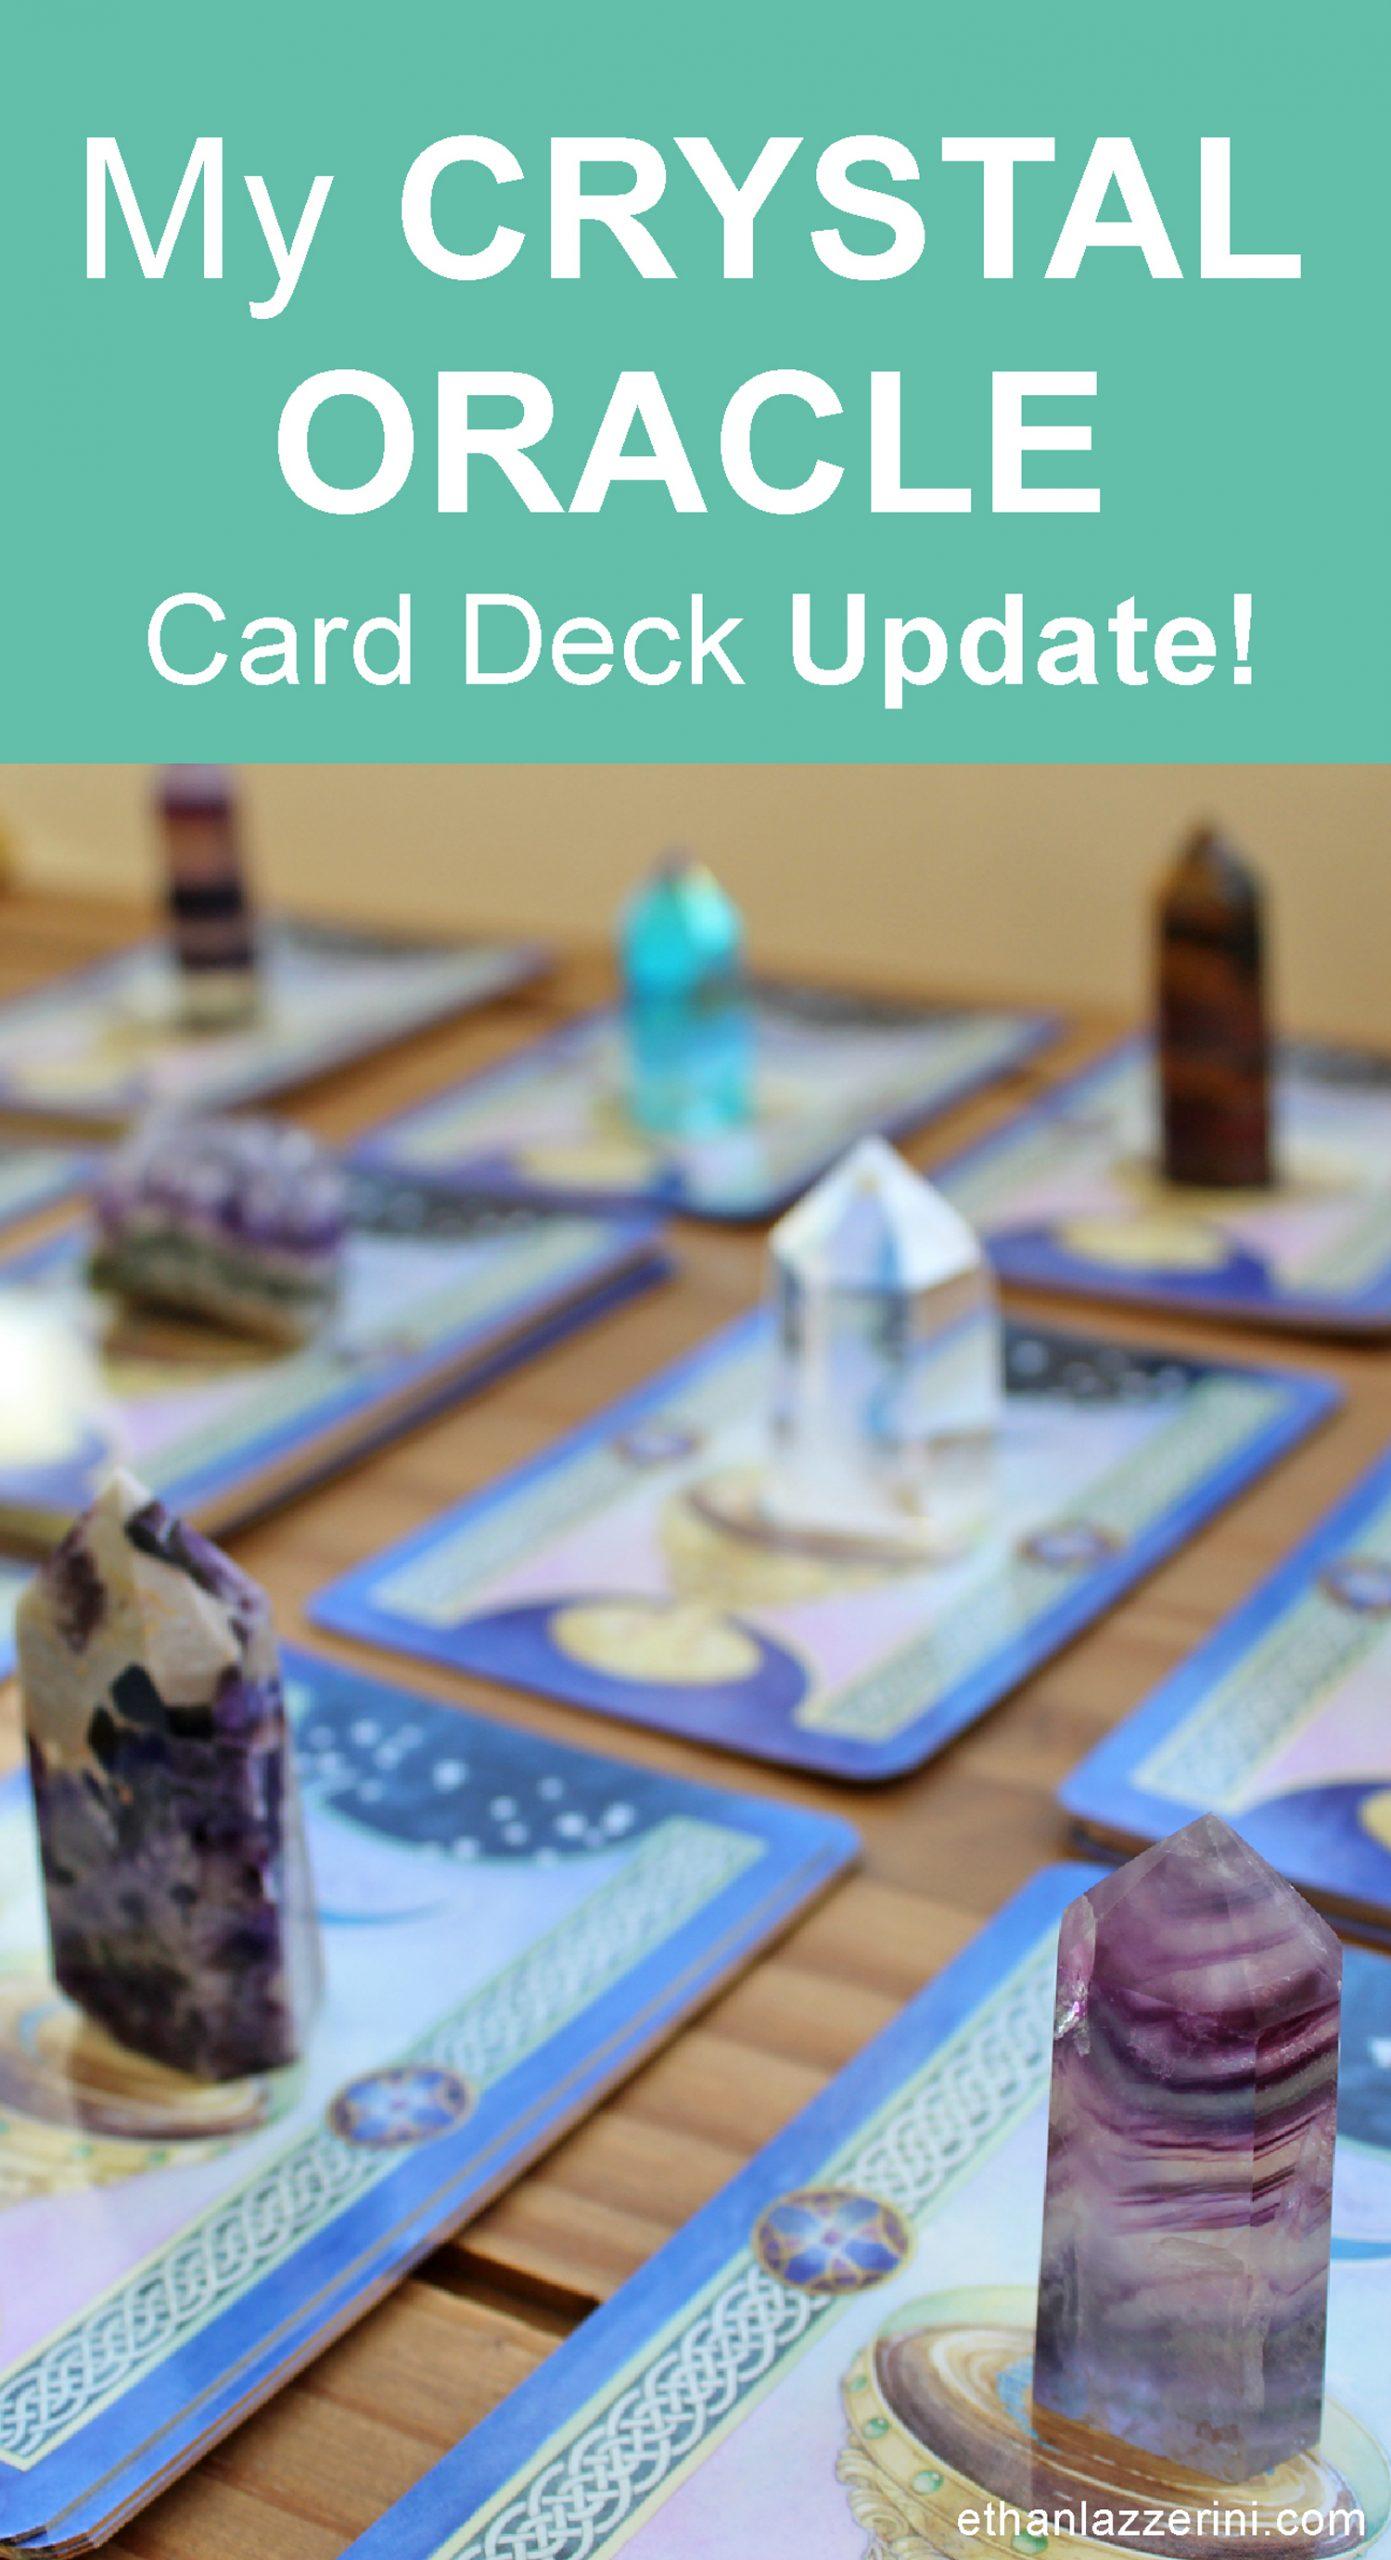 My crystal oracle cards update